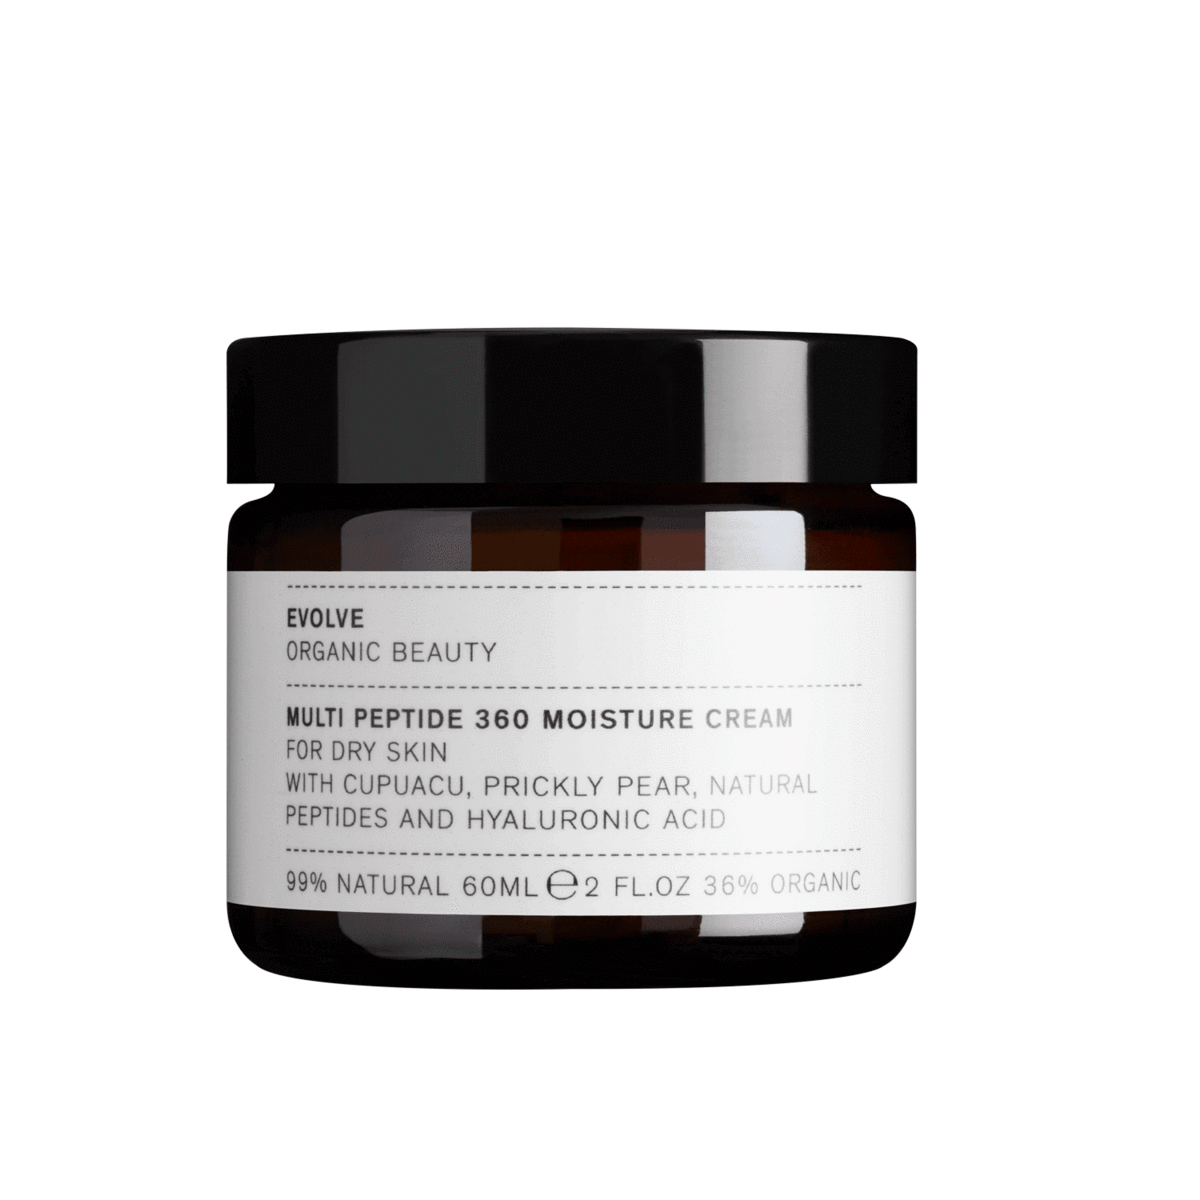 EVOLVE Multi Peptide 360 Moisture Cream 60ml